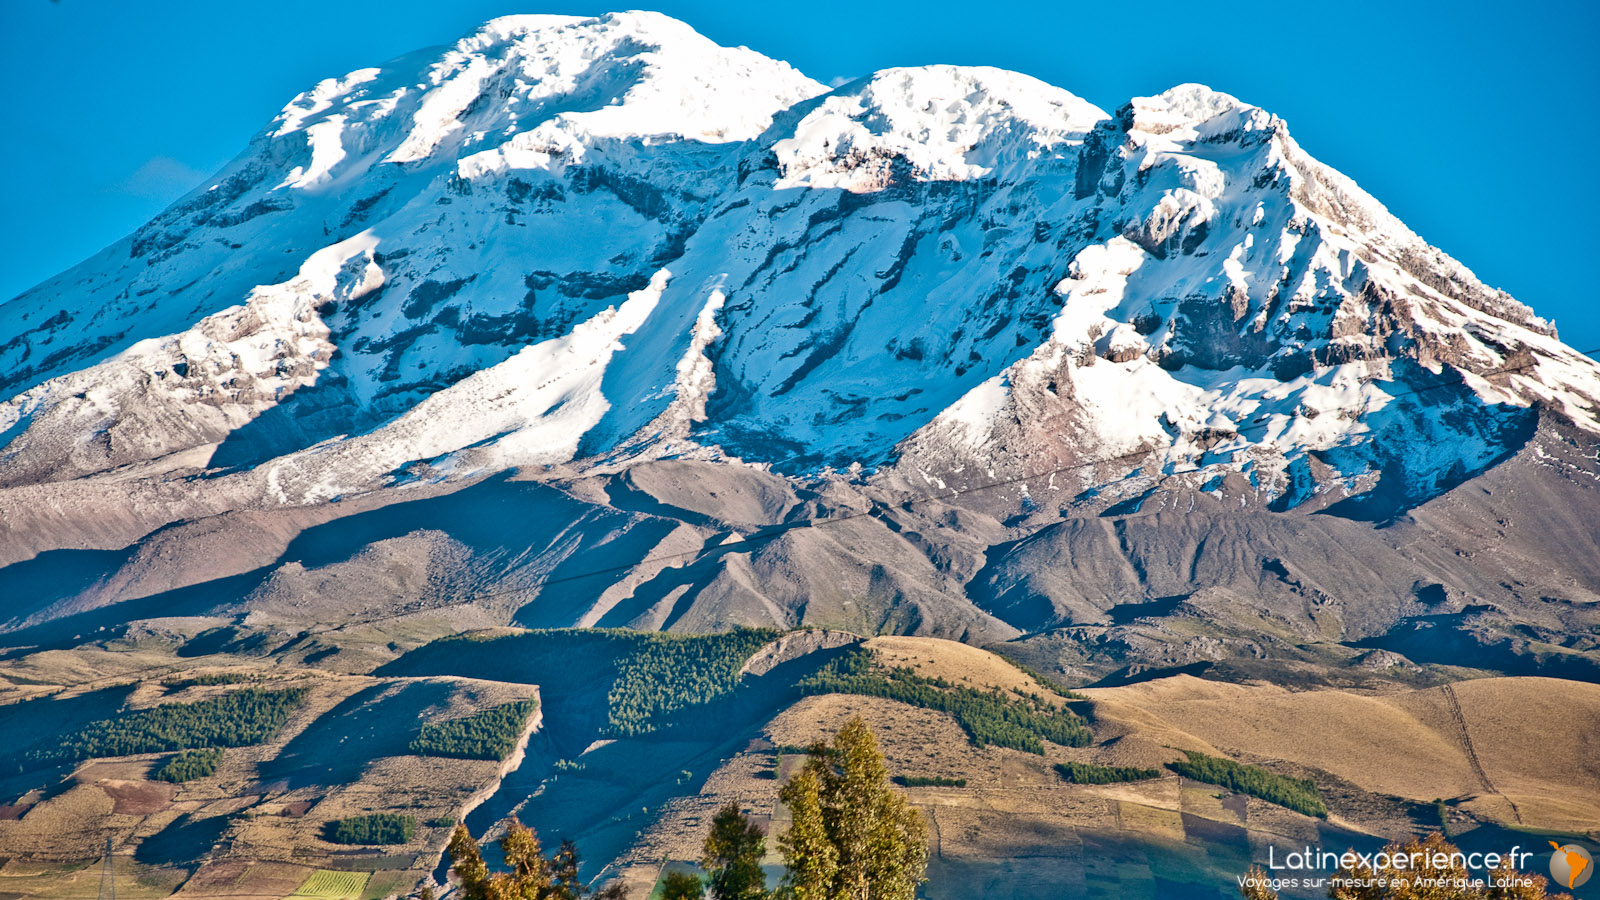 Equateur - Voyage en train -Volcan Chimborazo - Latinexperience